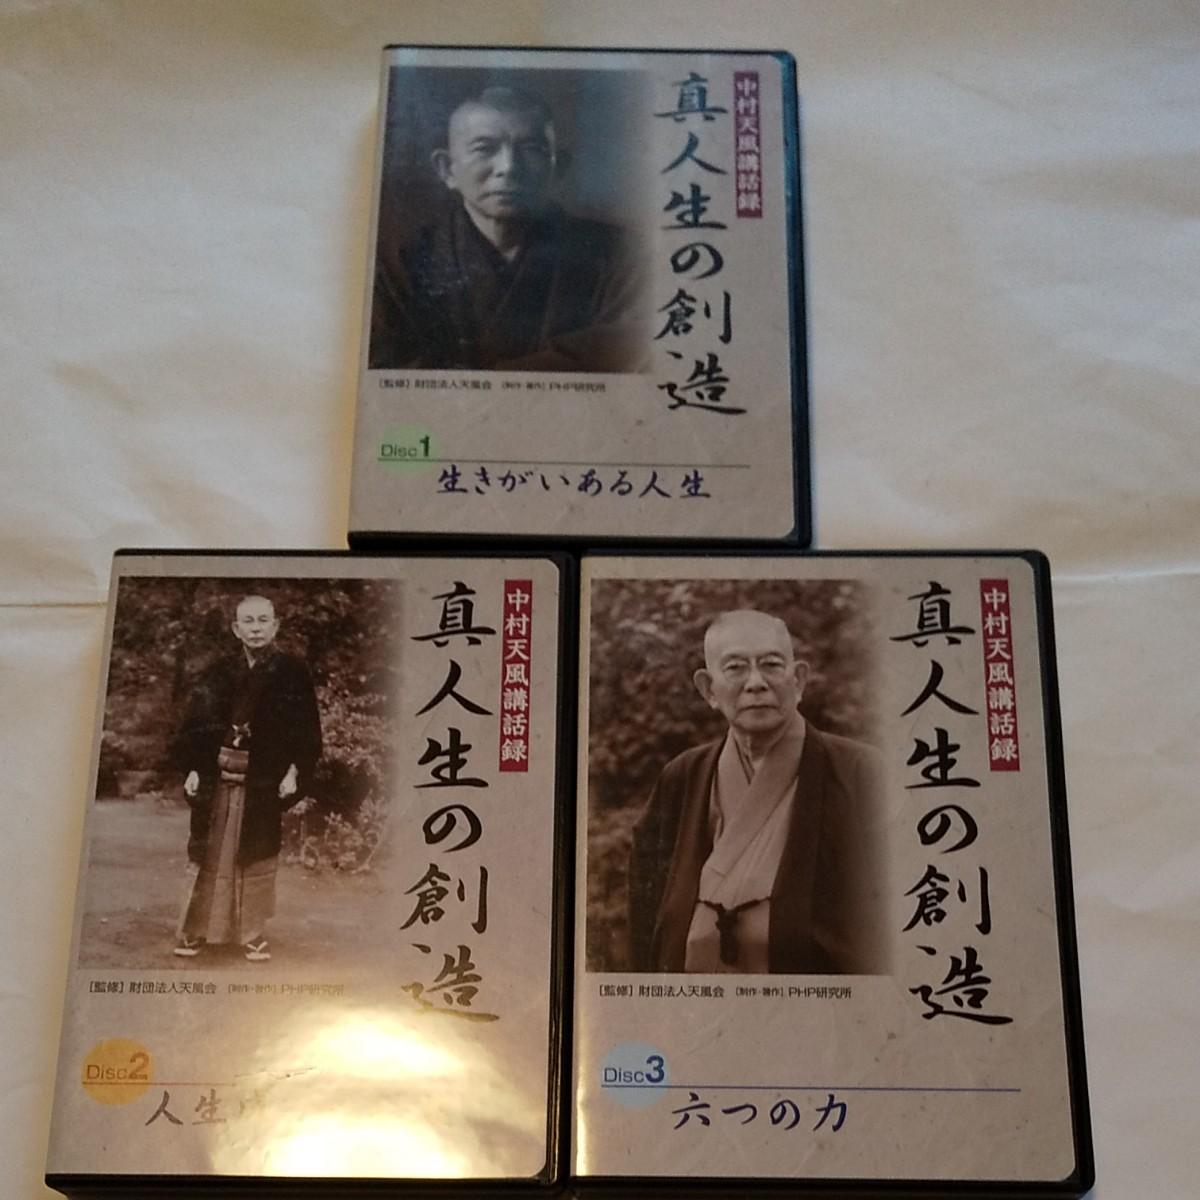 廃盤  中村天風先生 三枚組CD全巻セット 真人生の創造 東洋哲学の自己啓発 ヨガ